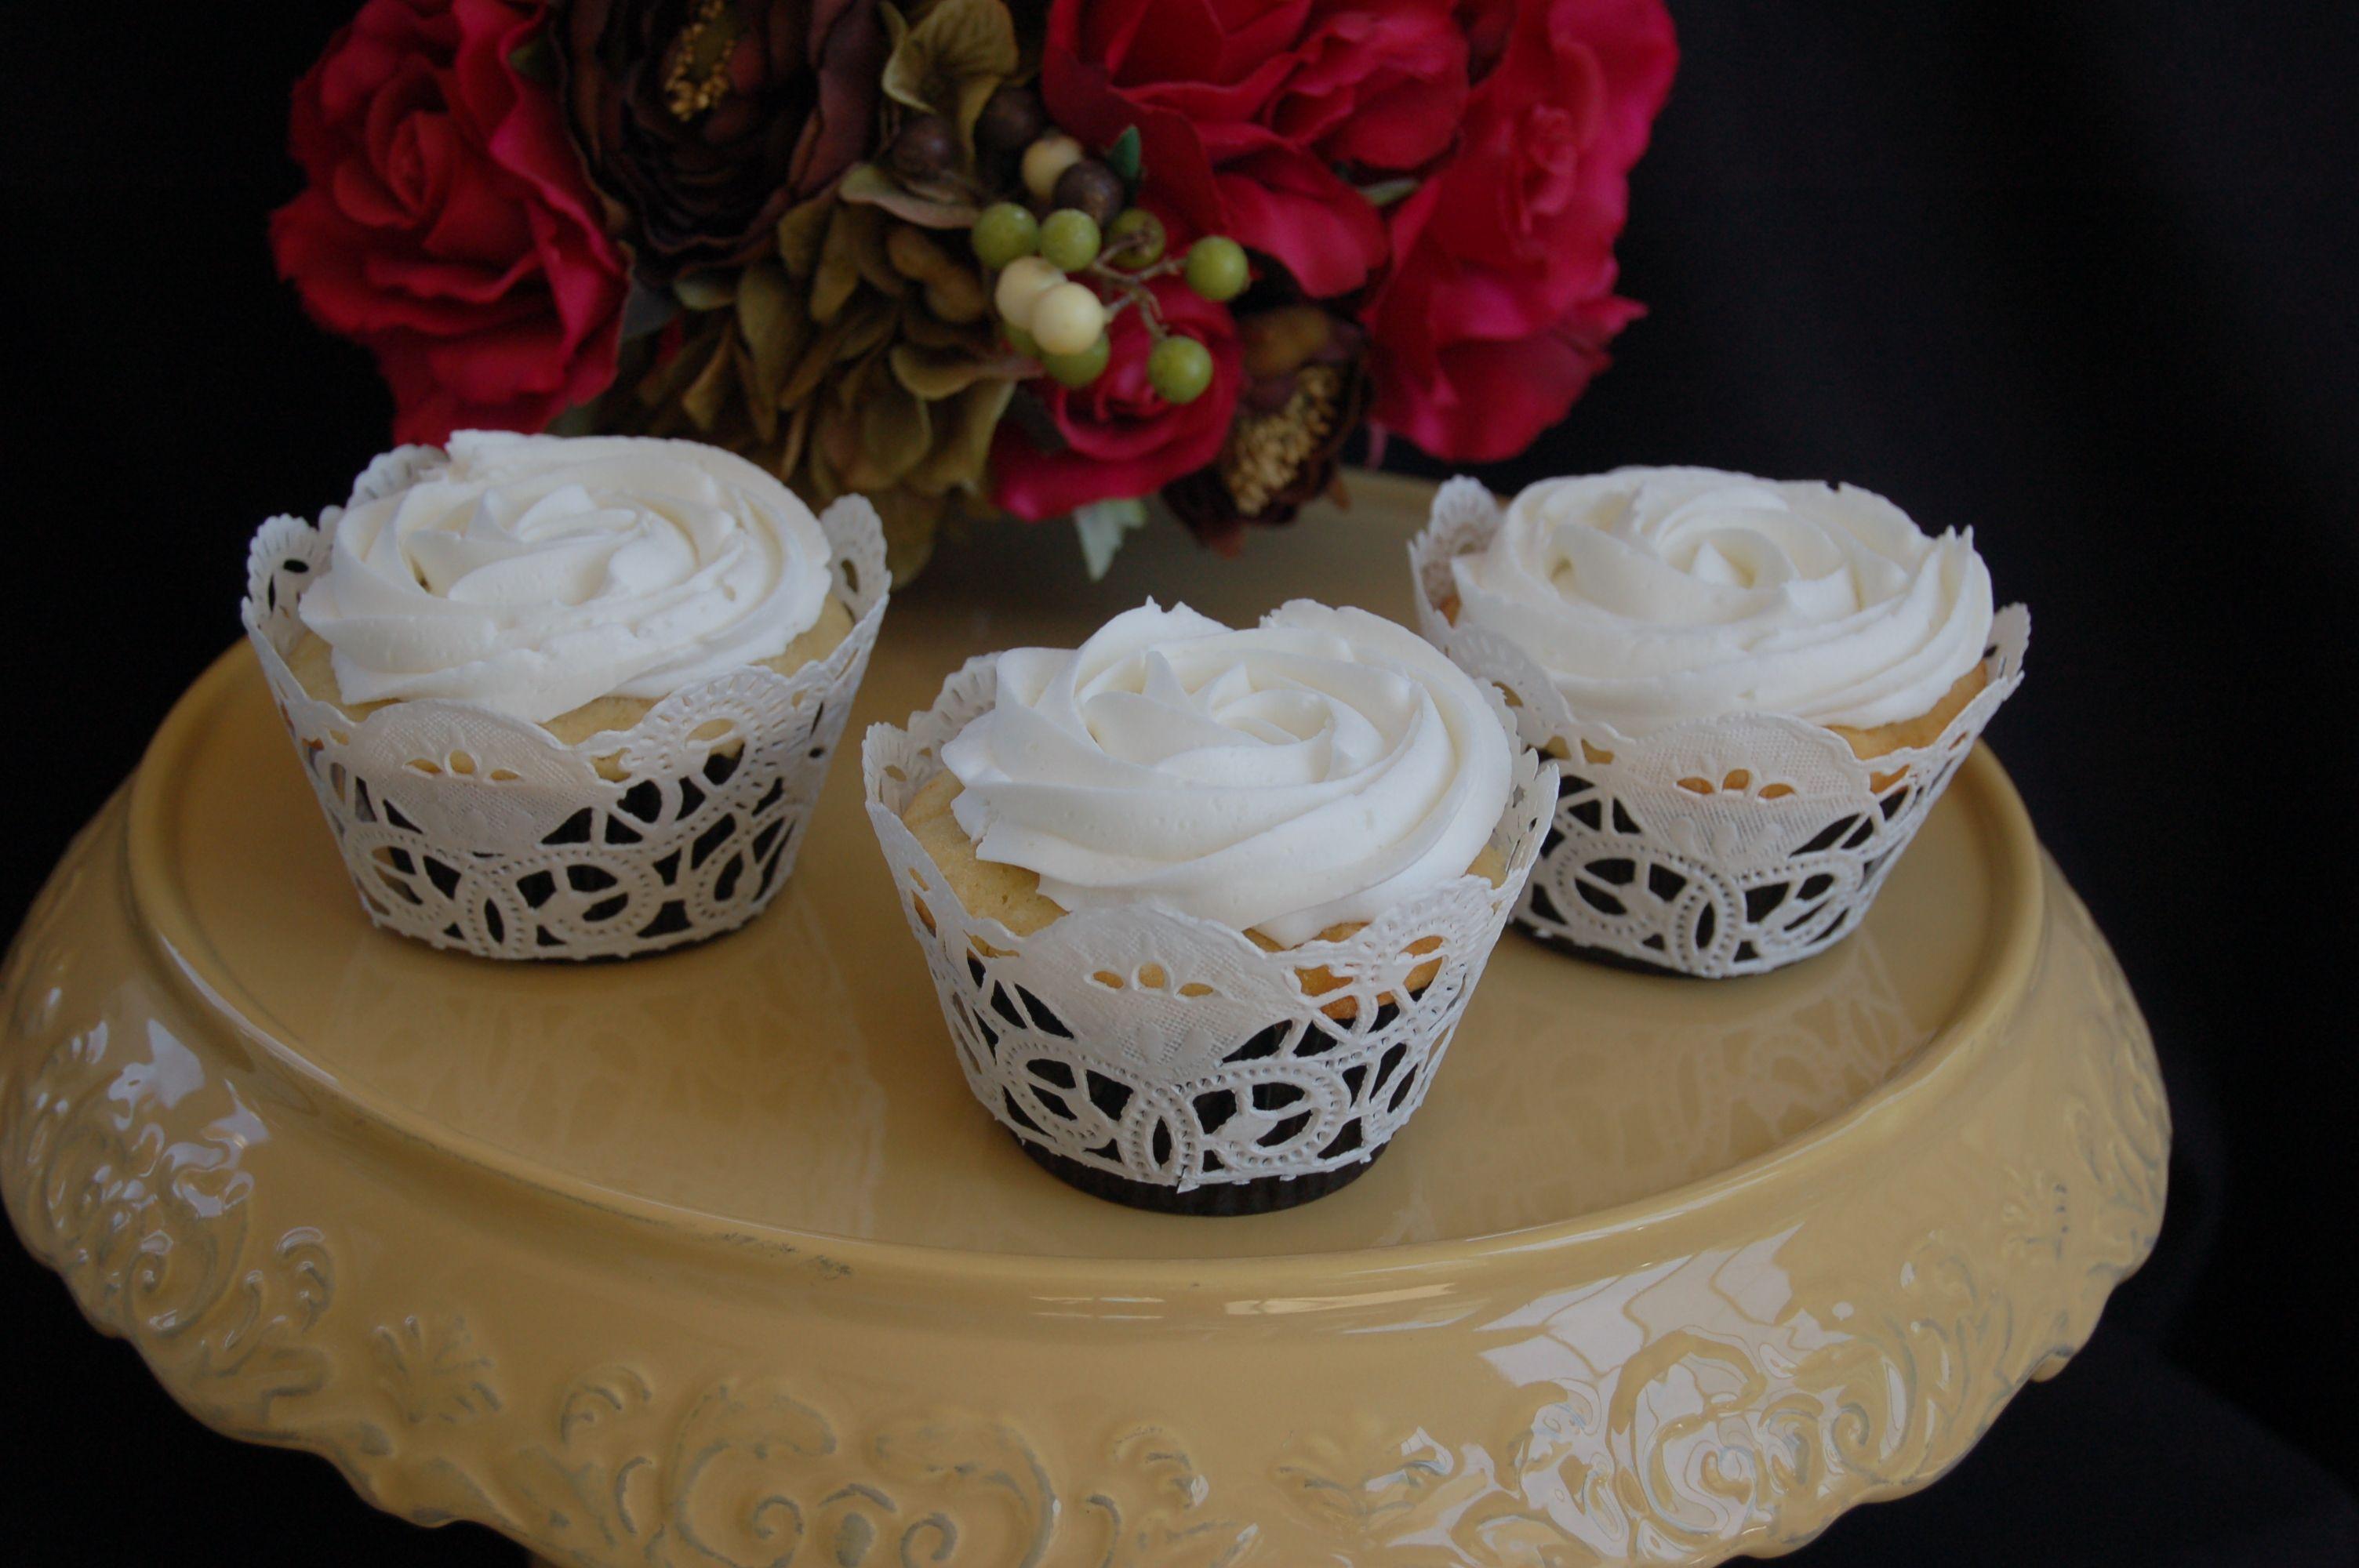 Sophisticakes Wedding Cupcakes Yummy Cupcakes Wedding Cupcakes Cake Decorating